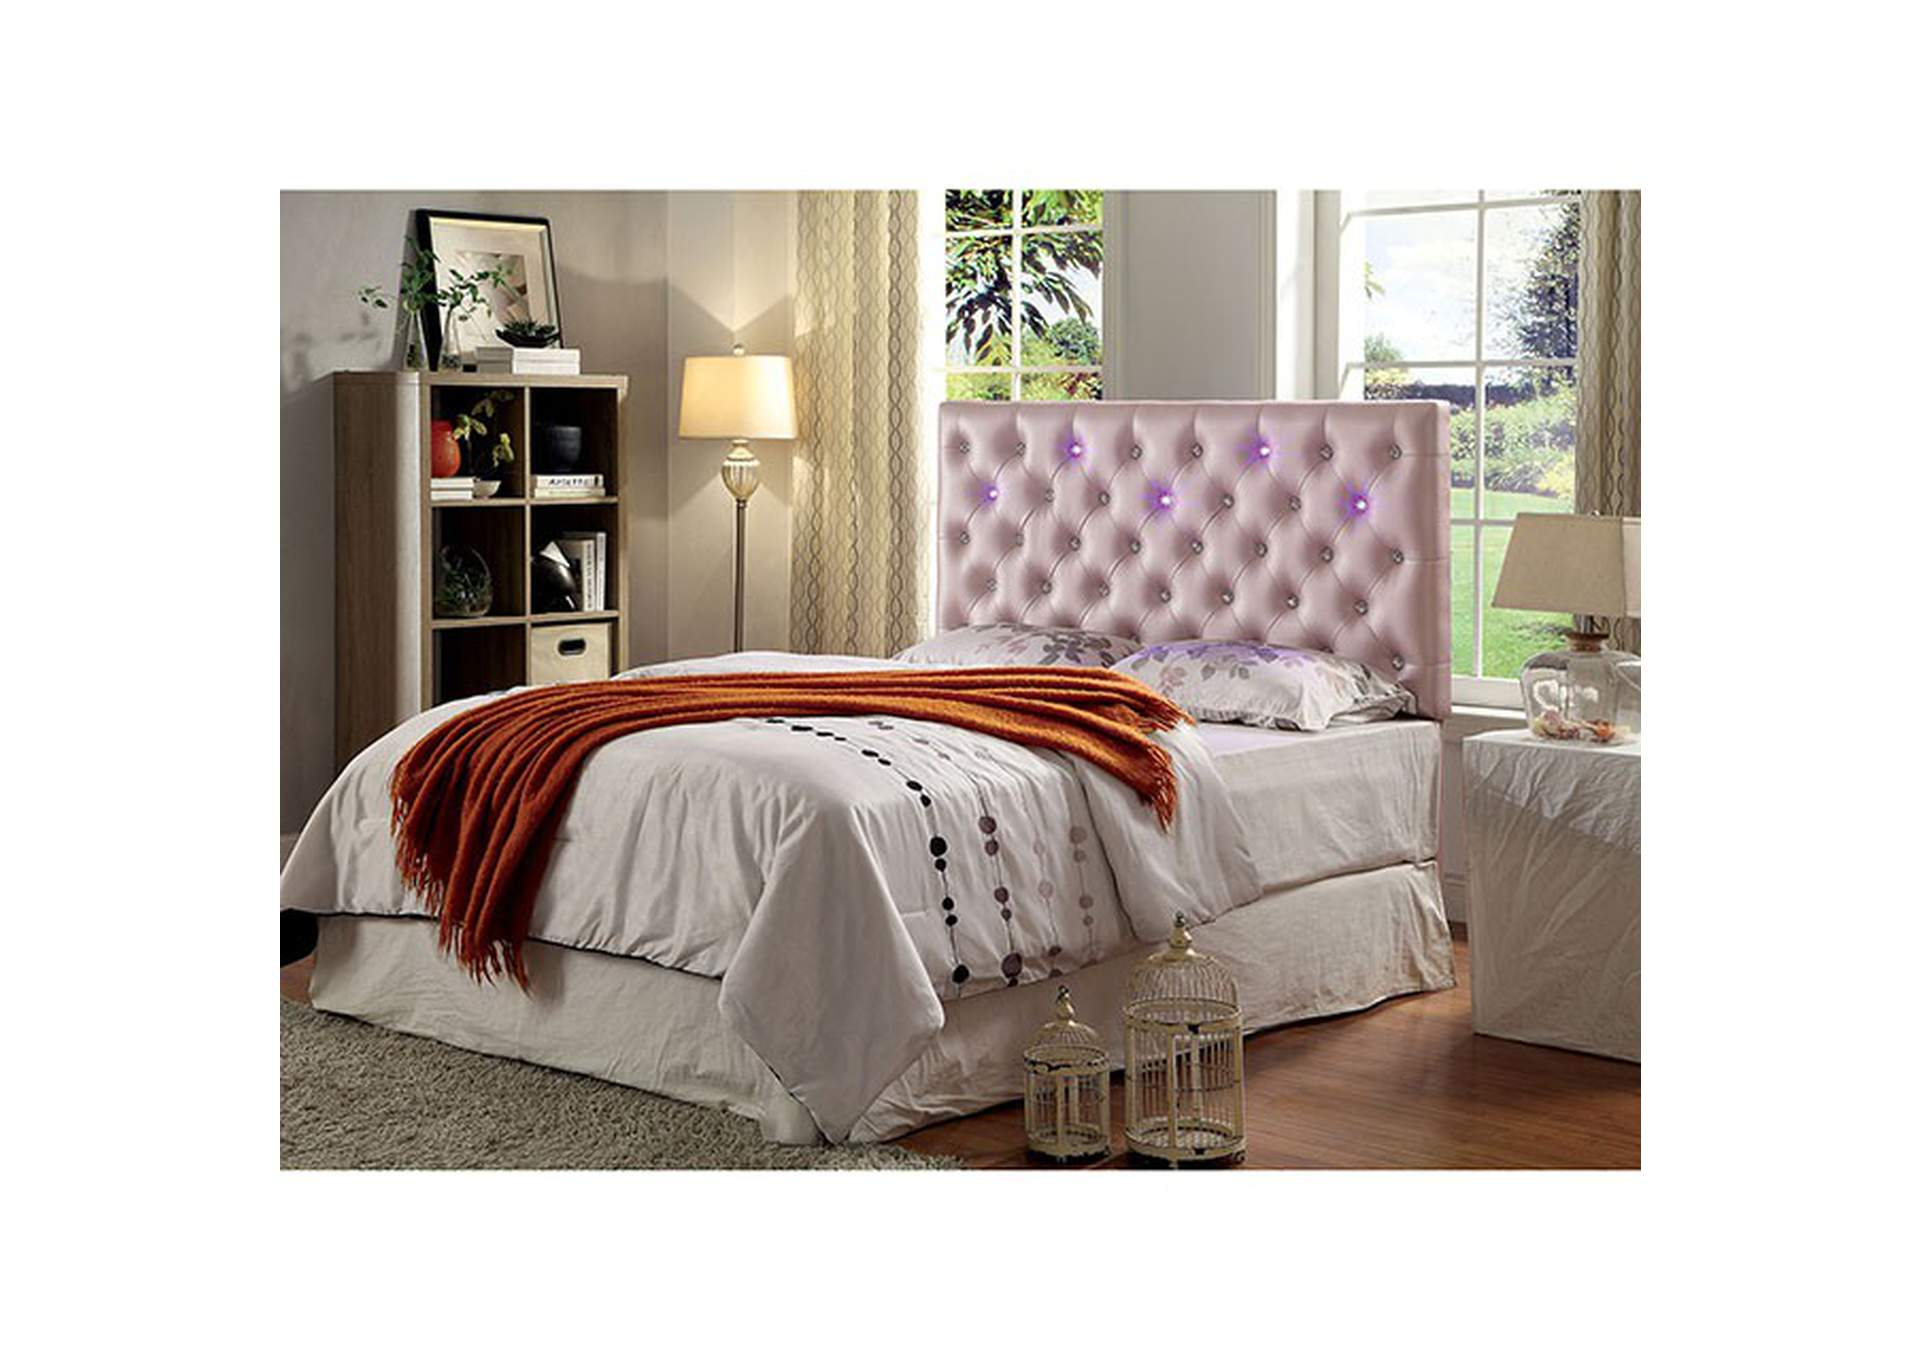 Aldebaran Pink Upholstered King Headboard Best Buy Furniture And Mattress